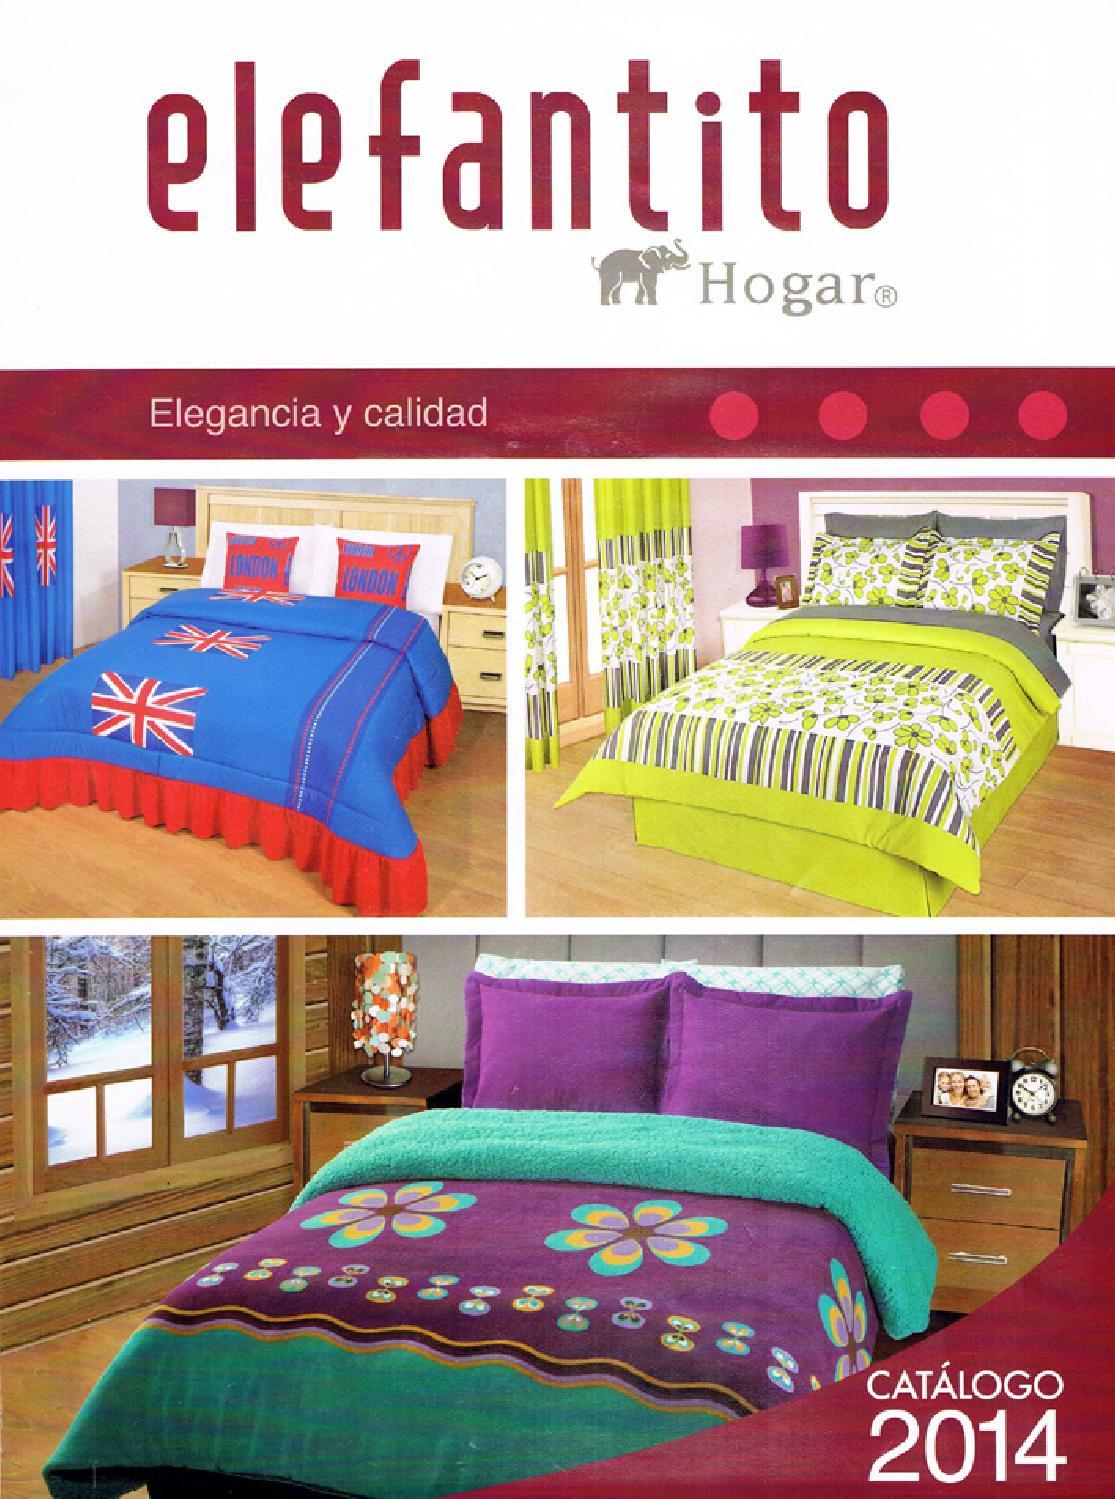 Catalogo elefantito hogar 2014 by colchas edredones y - Colchas y edredones ...